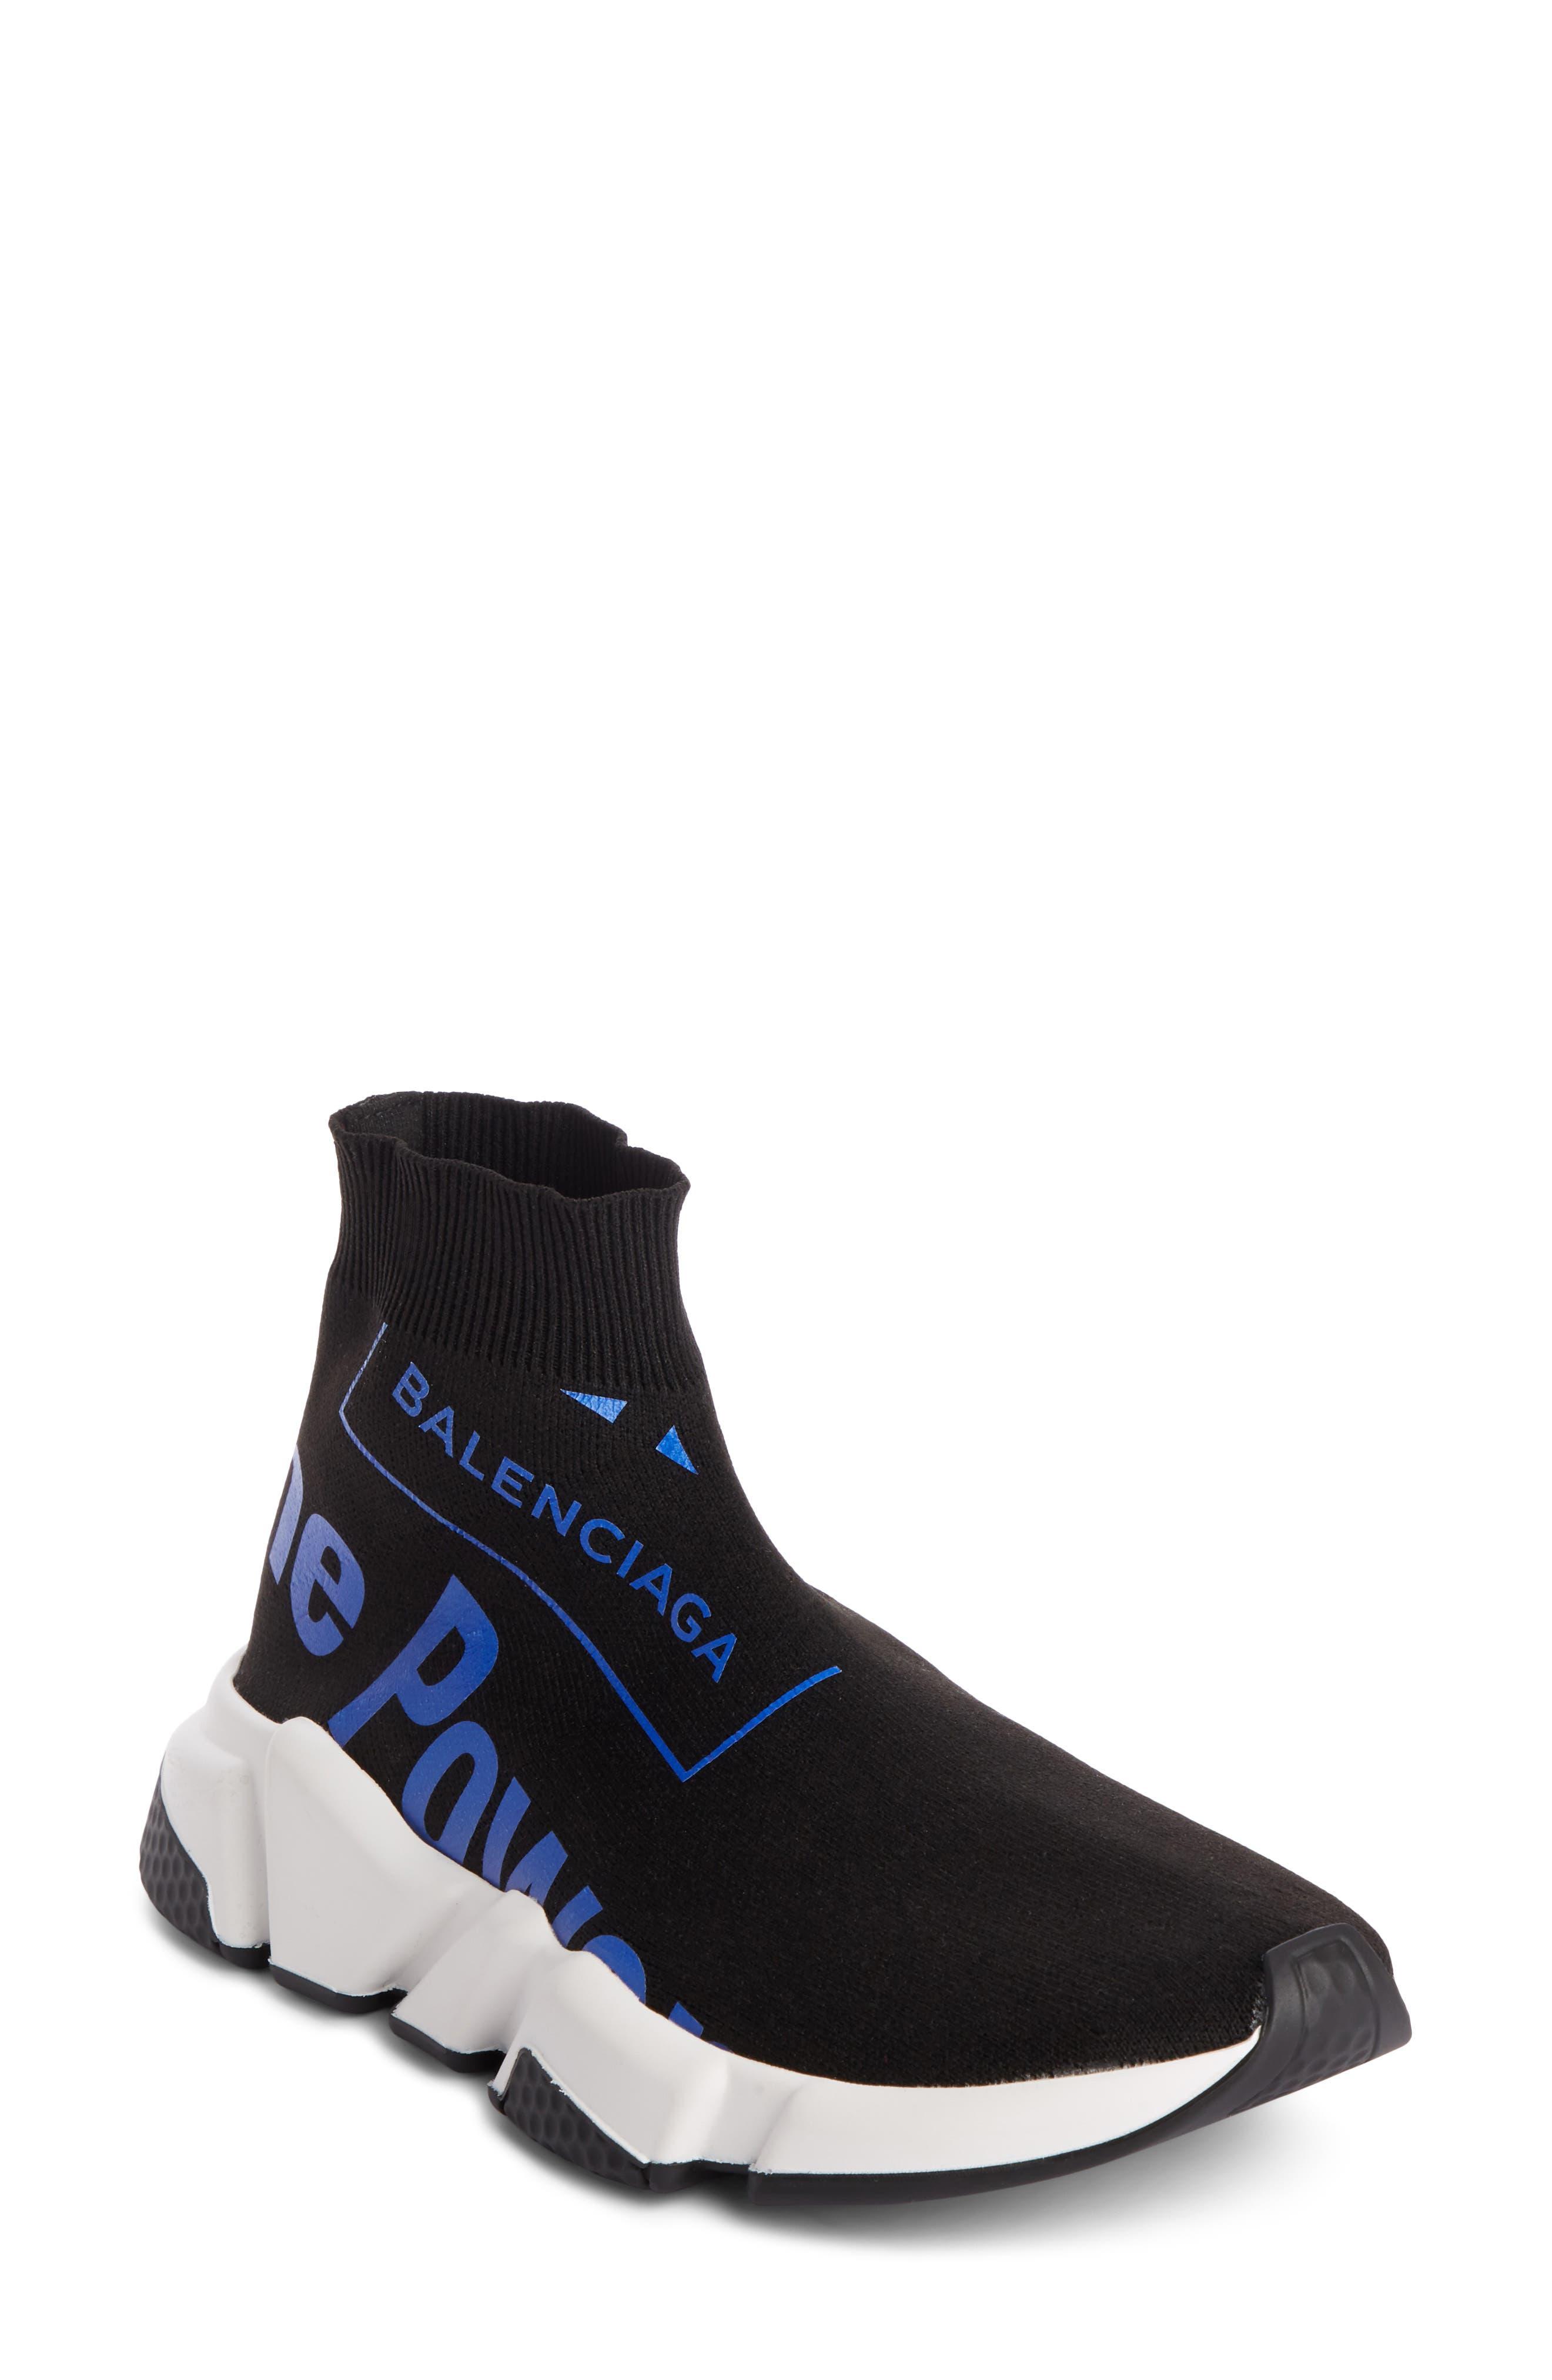 Dream Speed Trainer Sneaker,                         Main,                         color, Black/ Blue